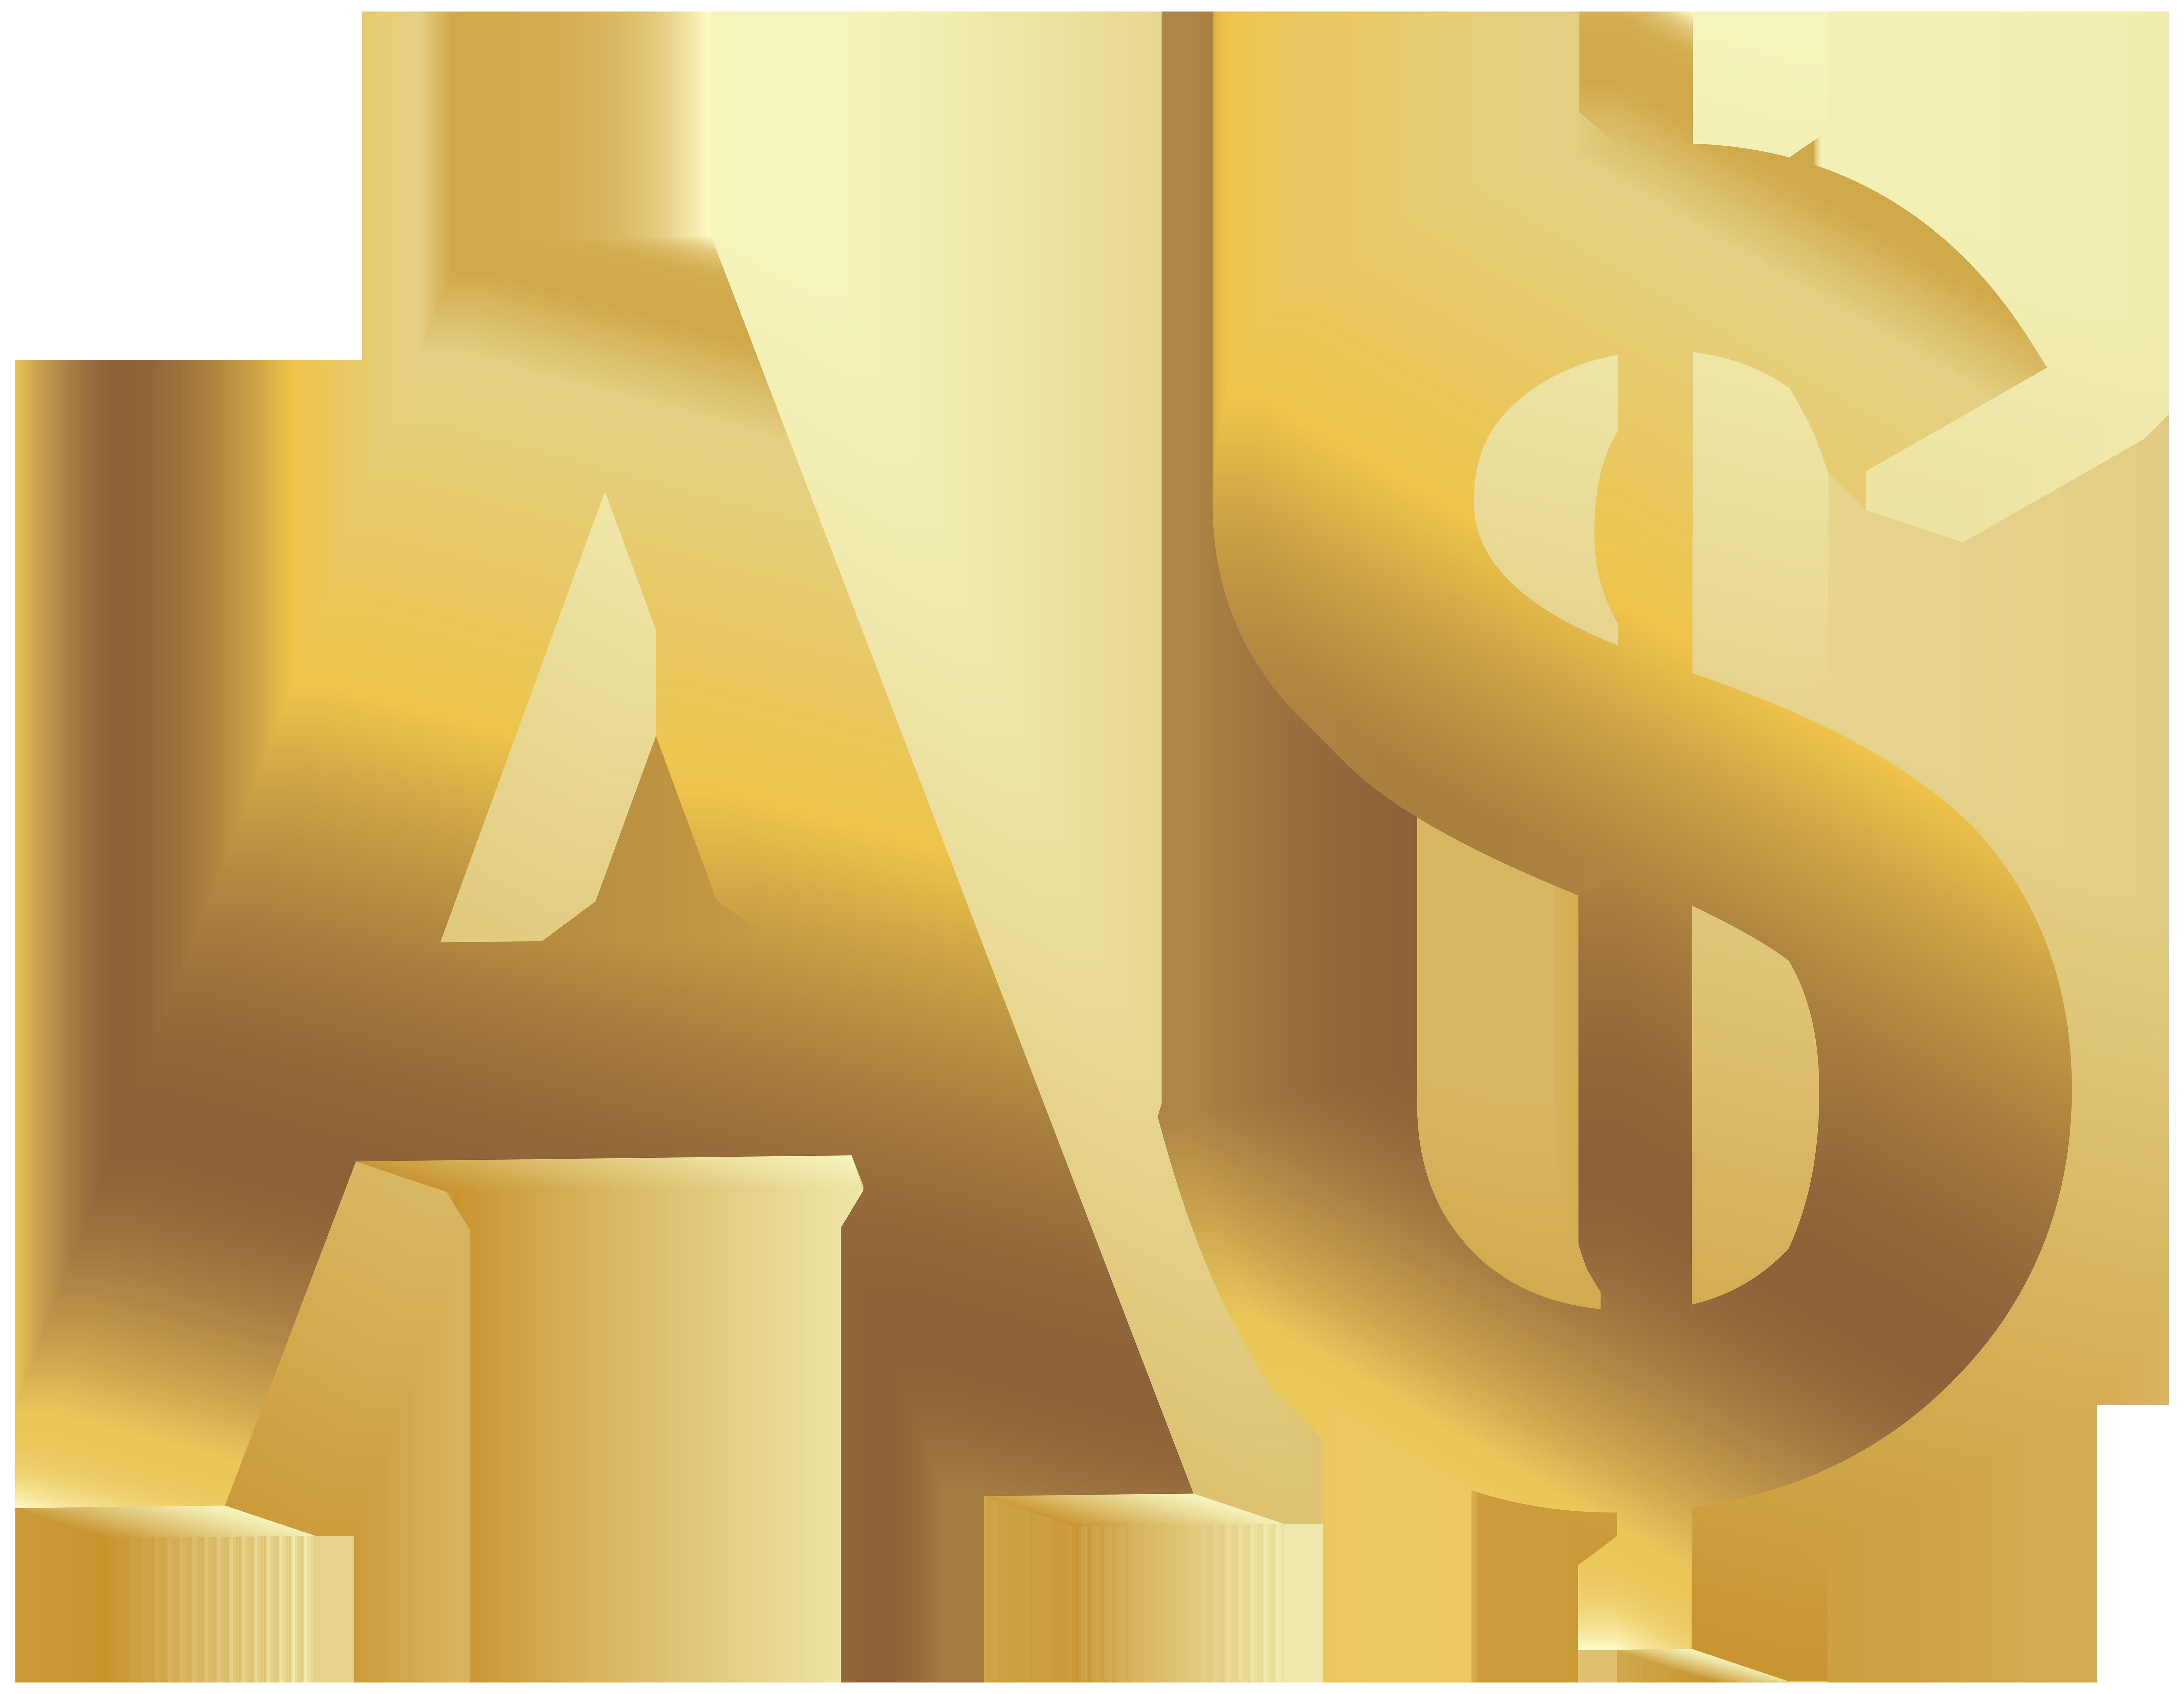 Australian money clipart free image library Australian Dollar Symbol PNG Clip Art - Best WEB Clipart image library